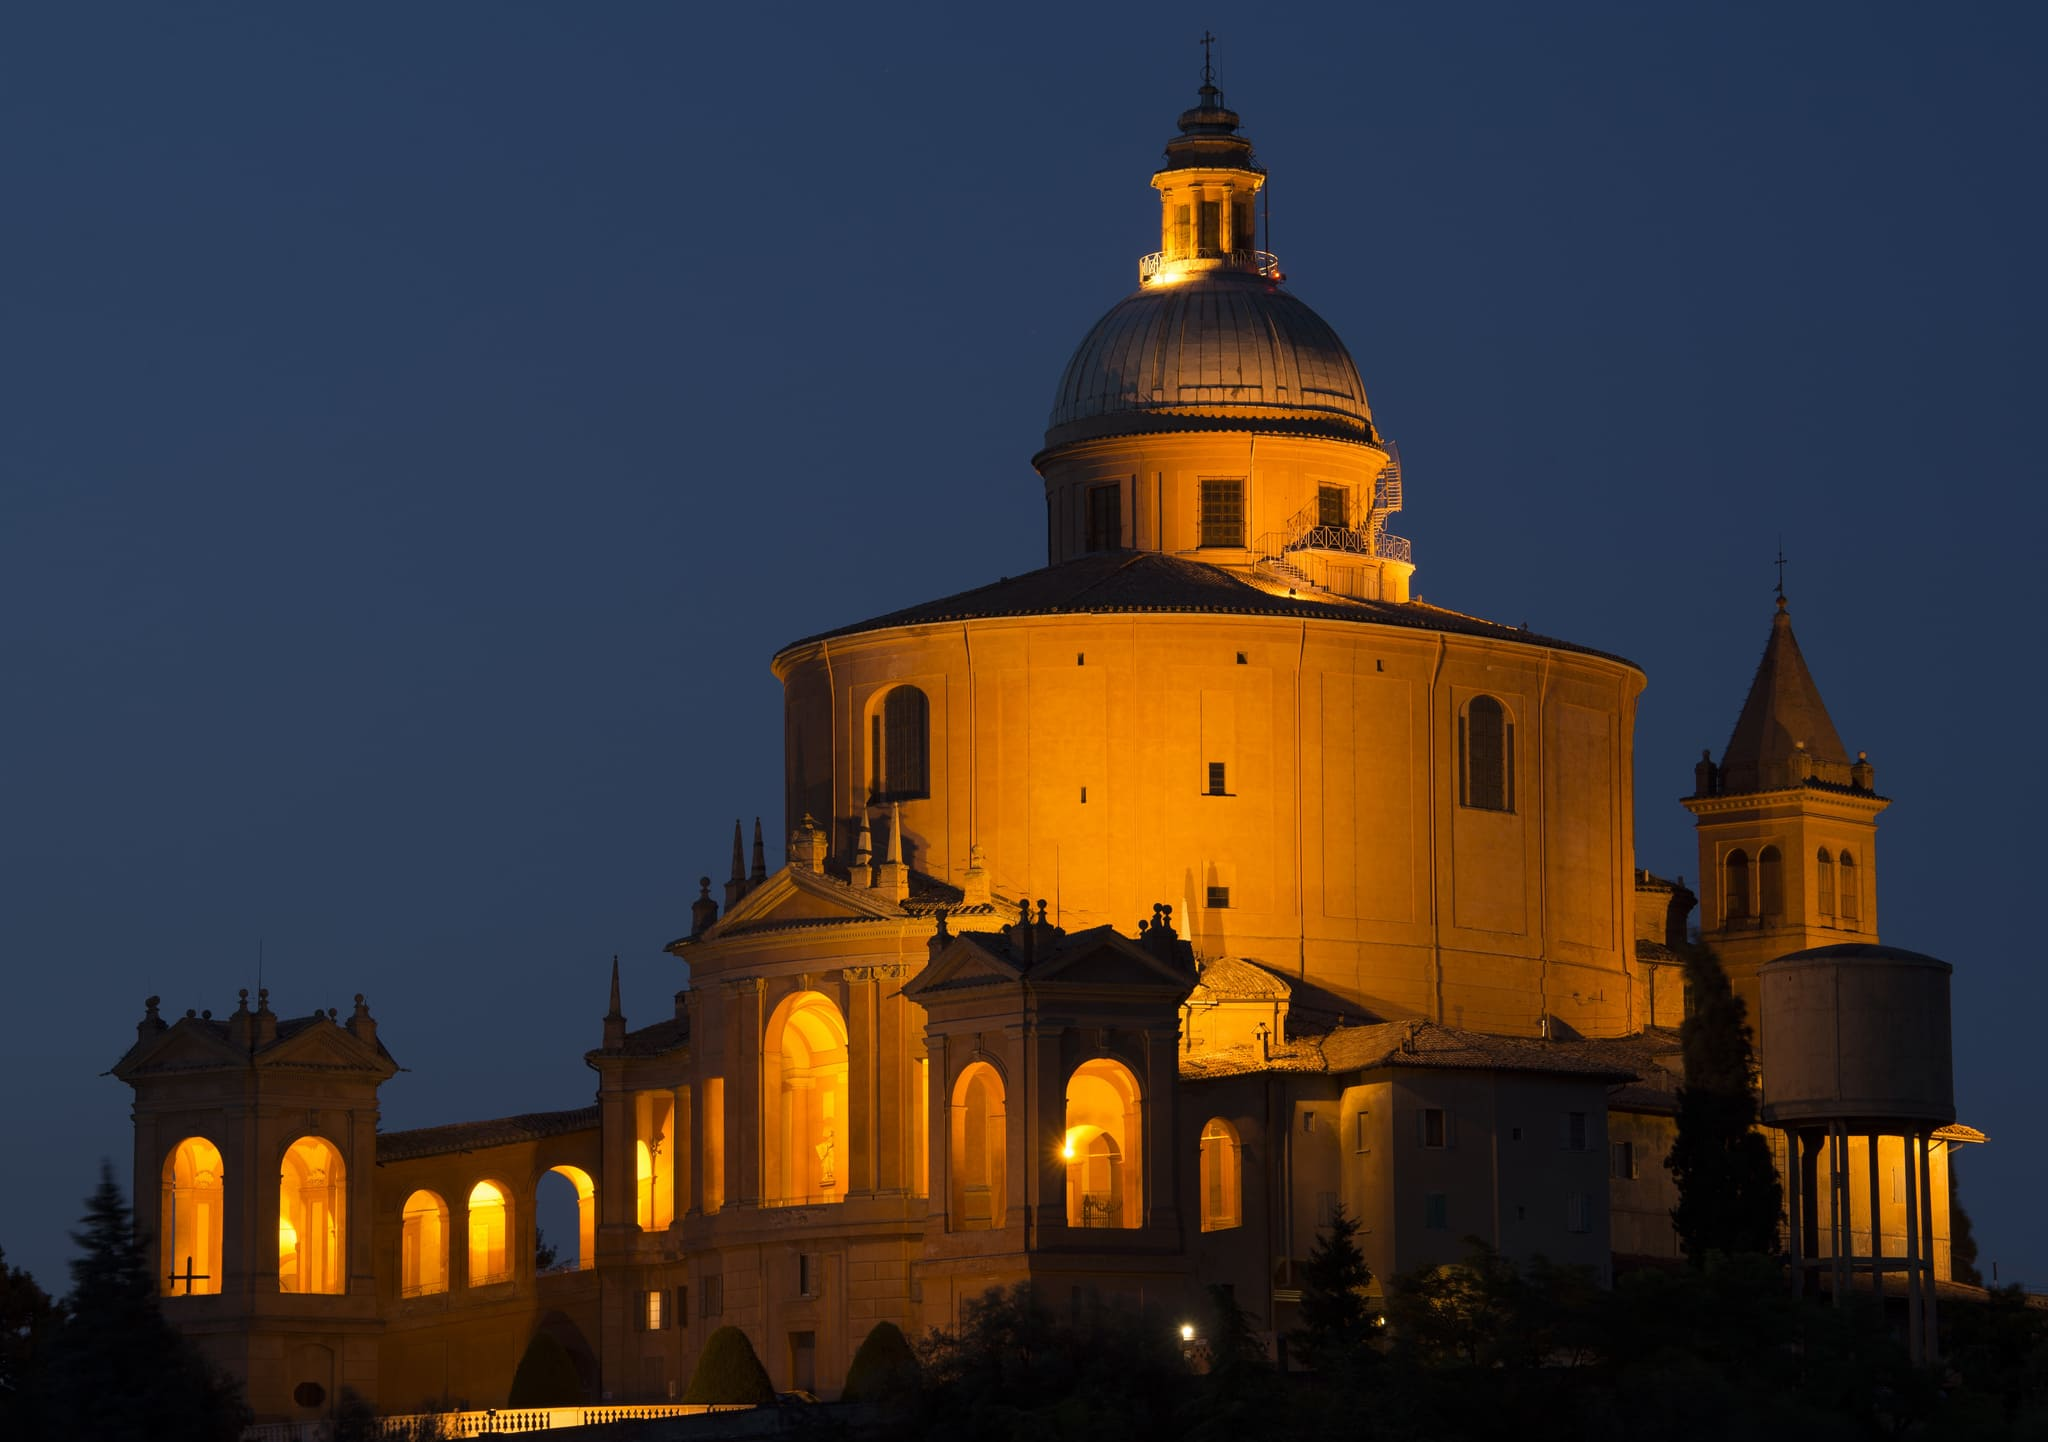 Santuario di San Luca di notte